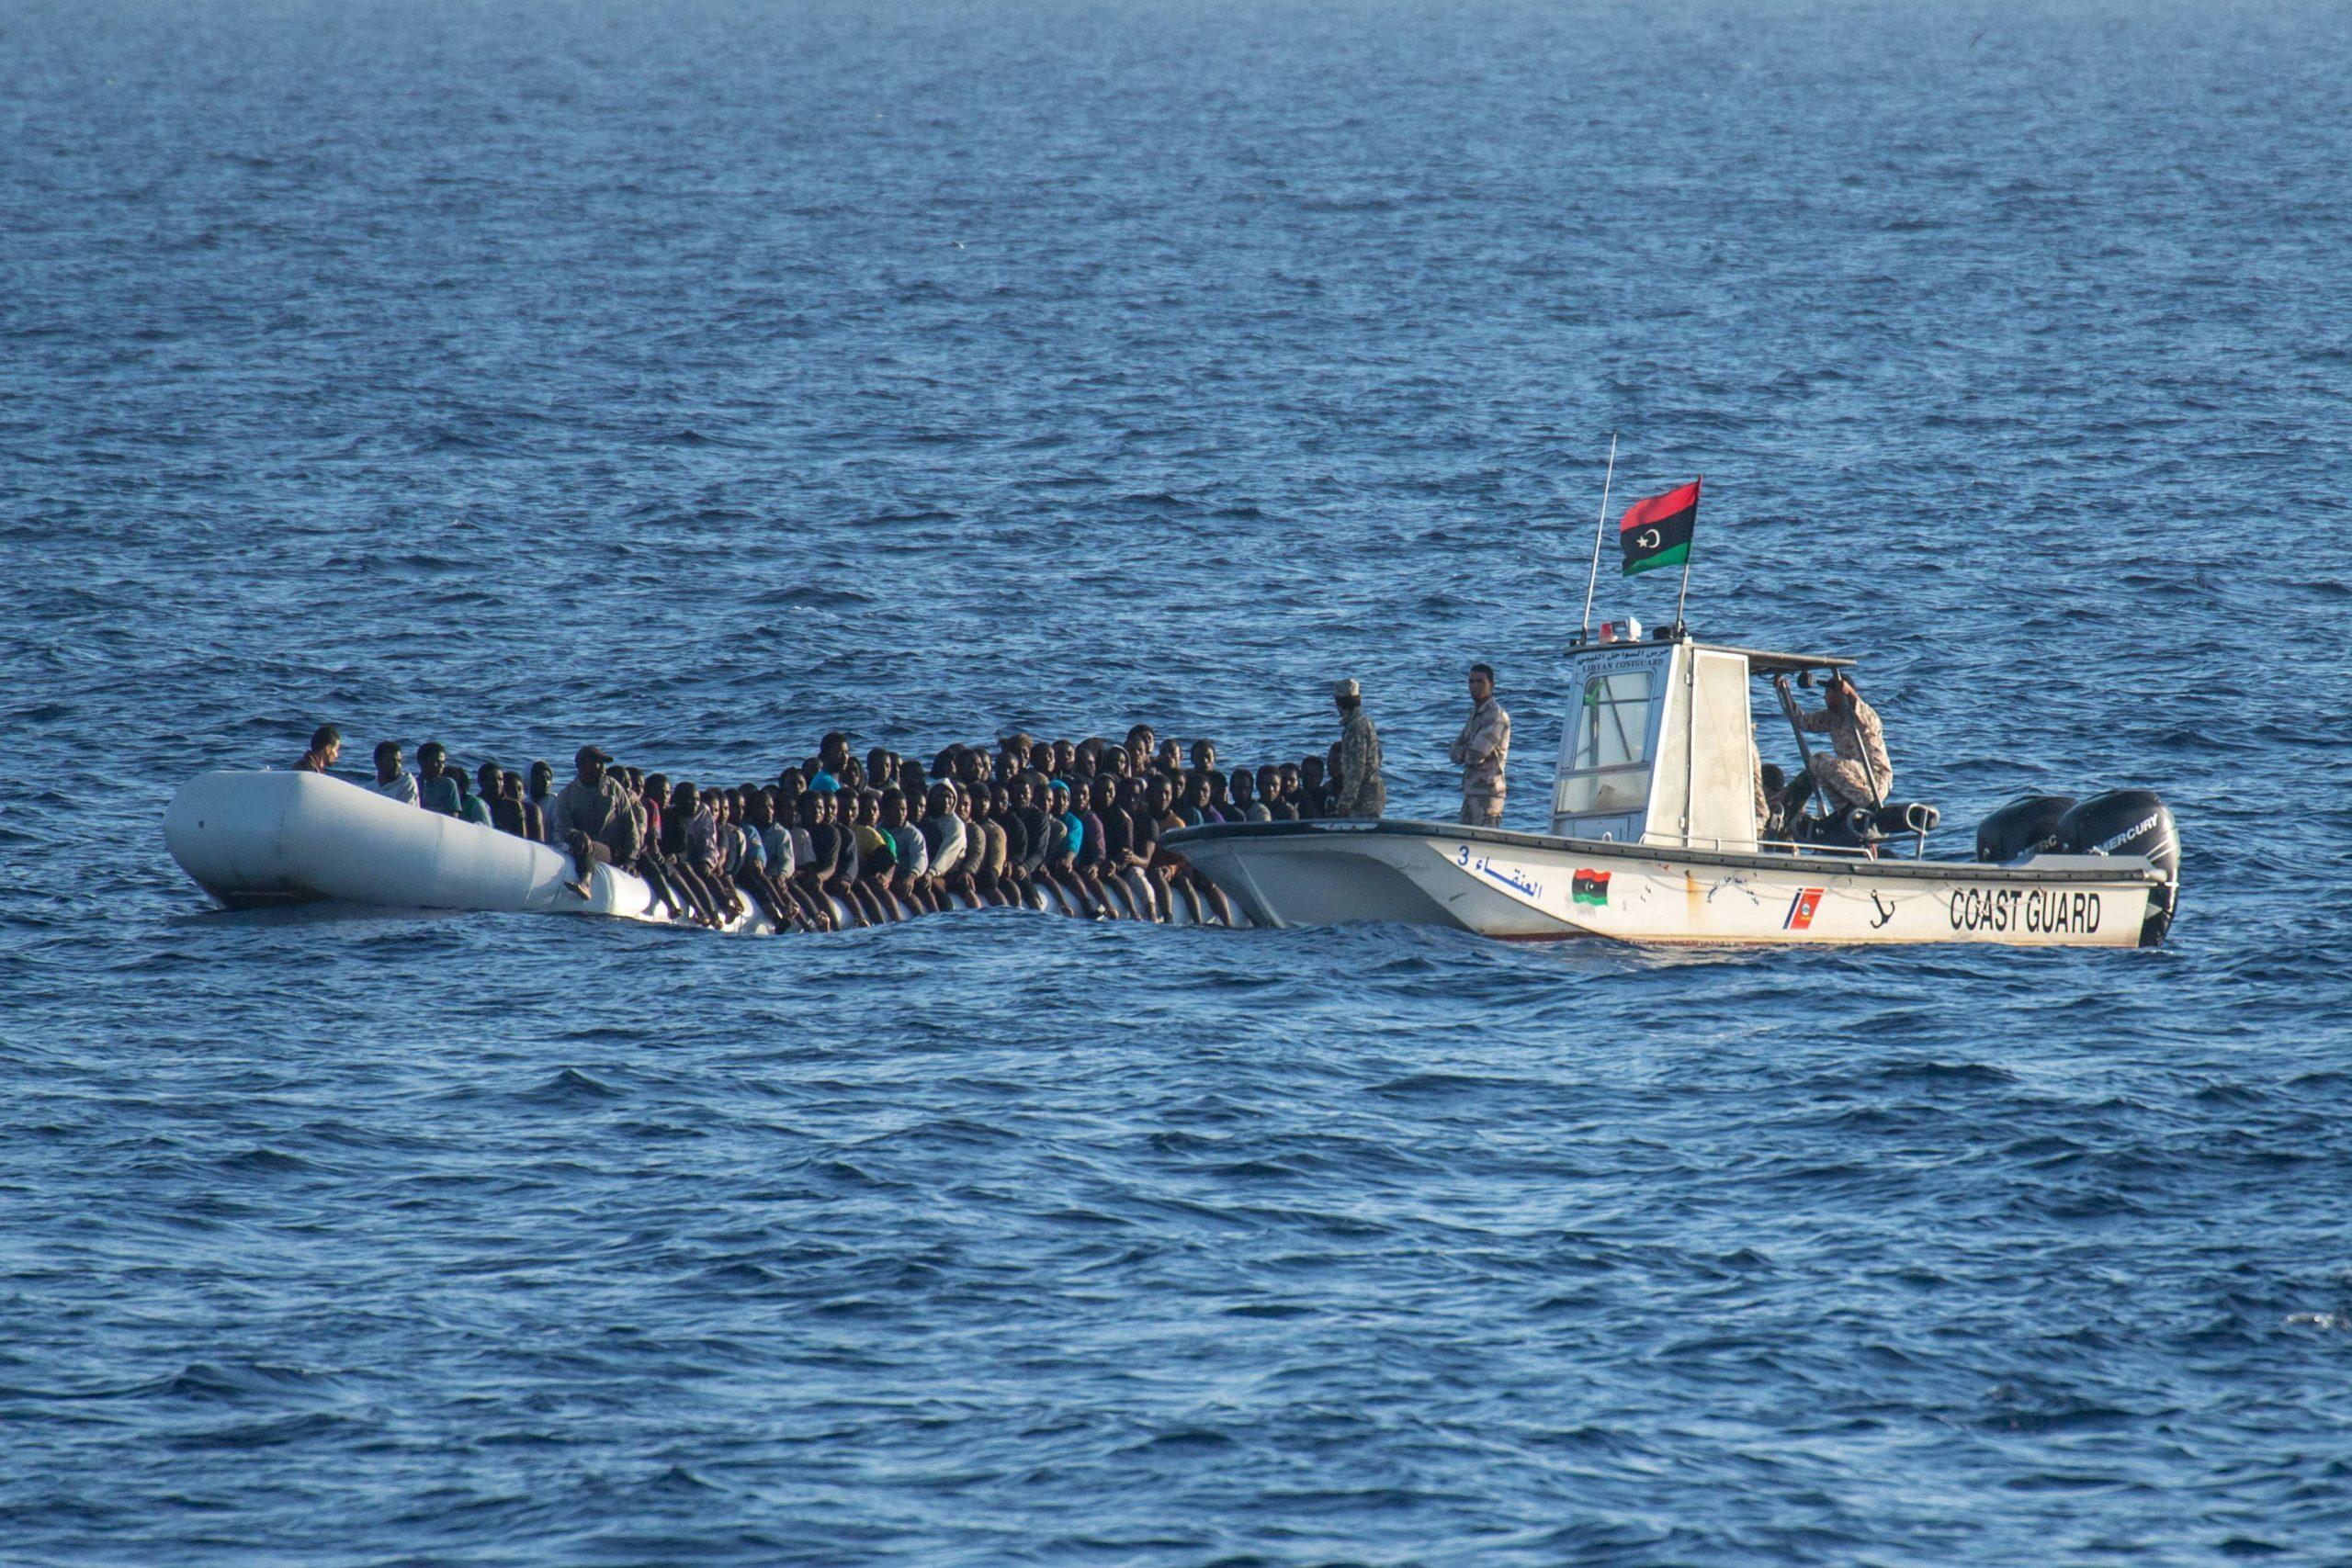 Migranten auf dem Mittelmeer (Archivbild) Foto: imago images / Christian Ditsch